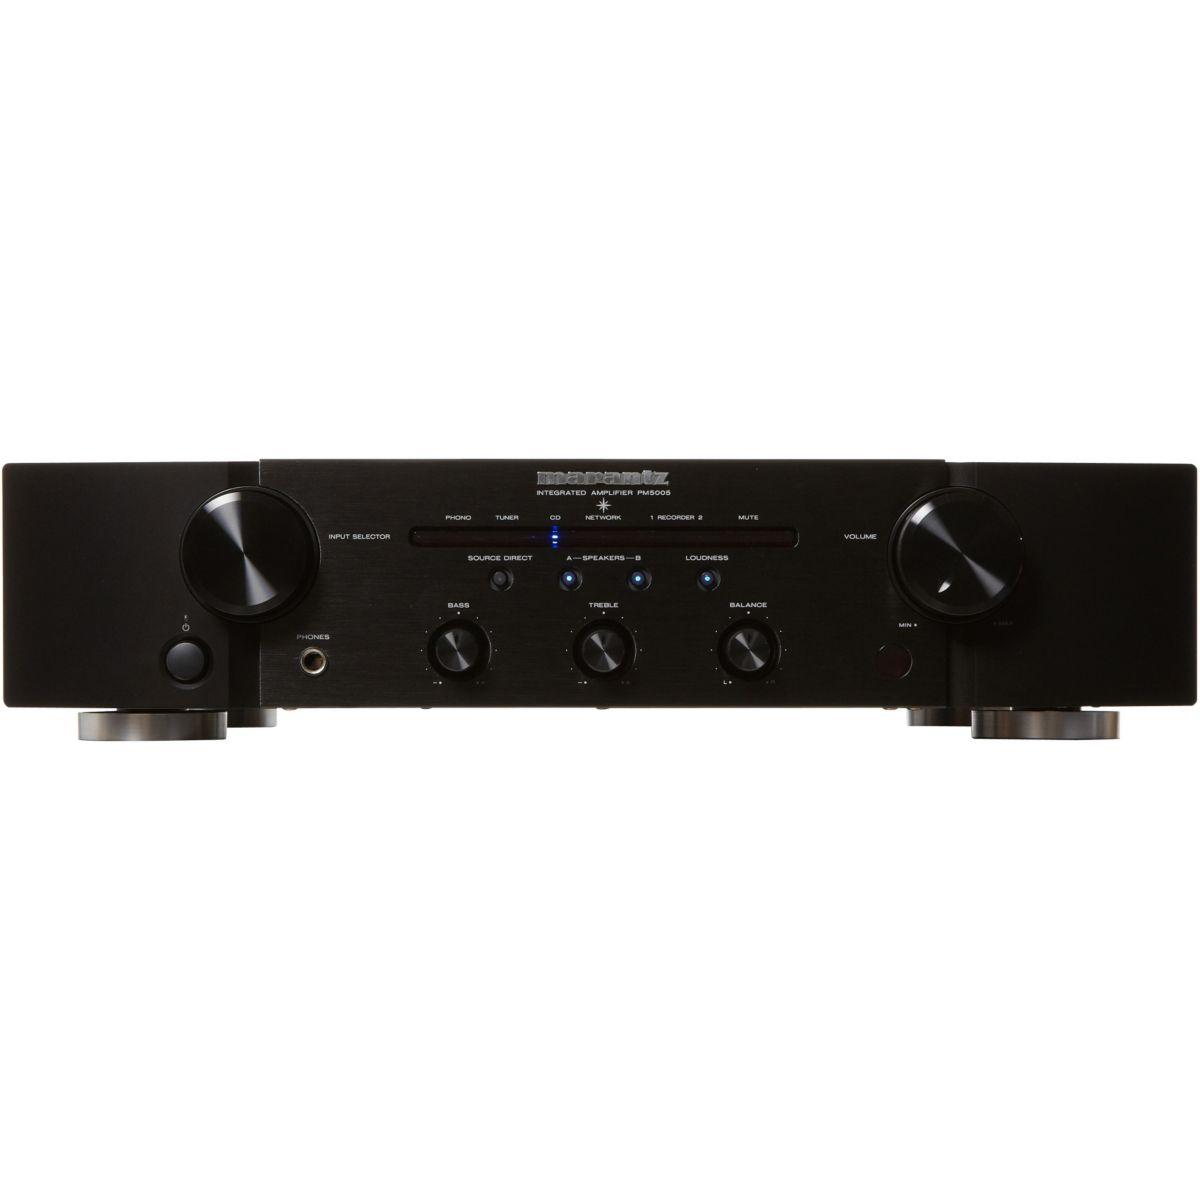 Amplificateur hifi marantz pm5005 noir (photo)